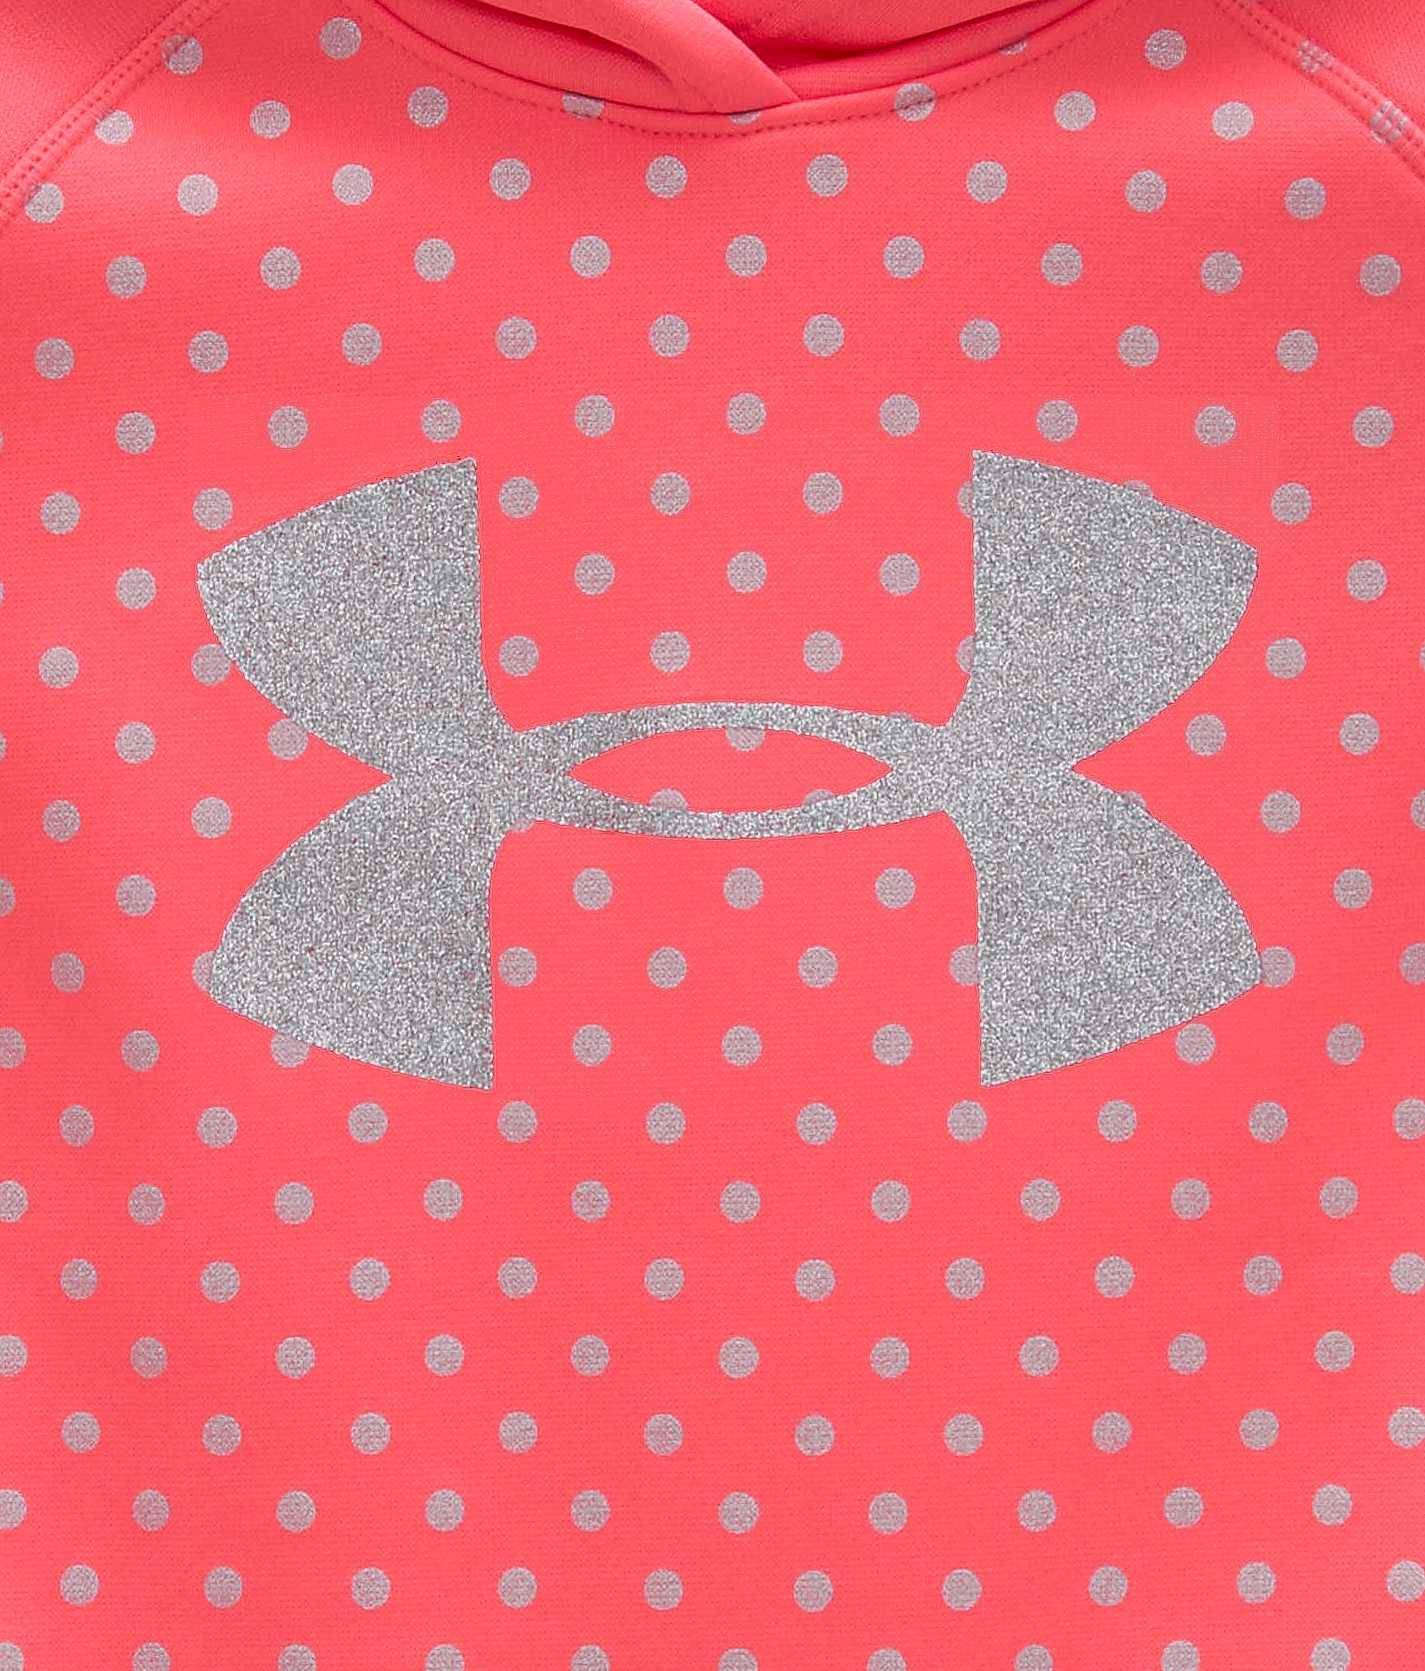 Under Armour Logo Wallpaper Girls Under Armour Big Logo 1425x1671